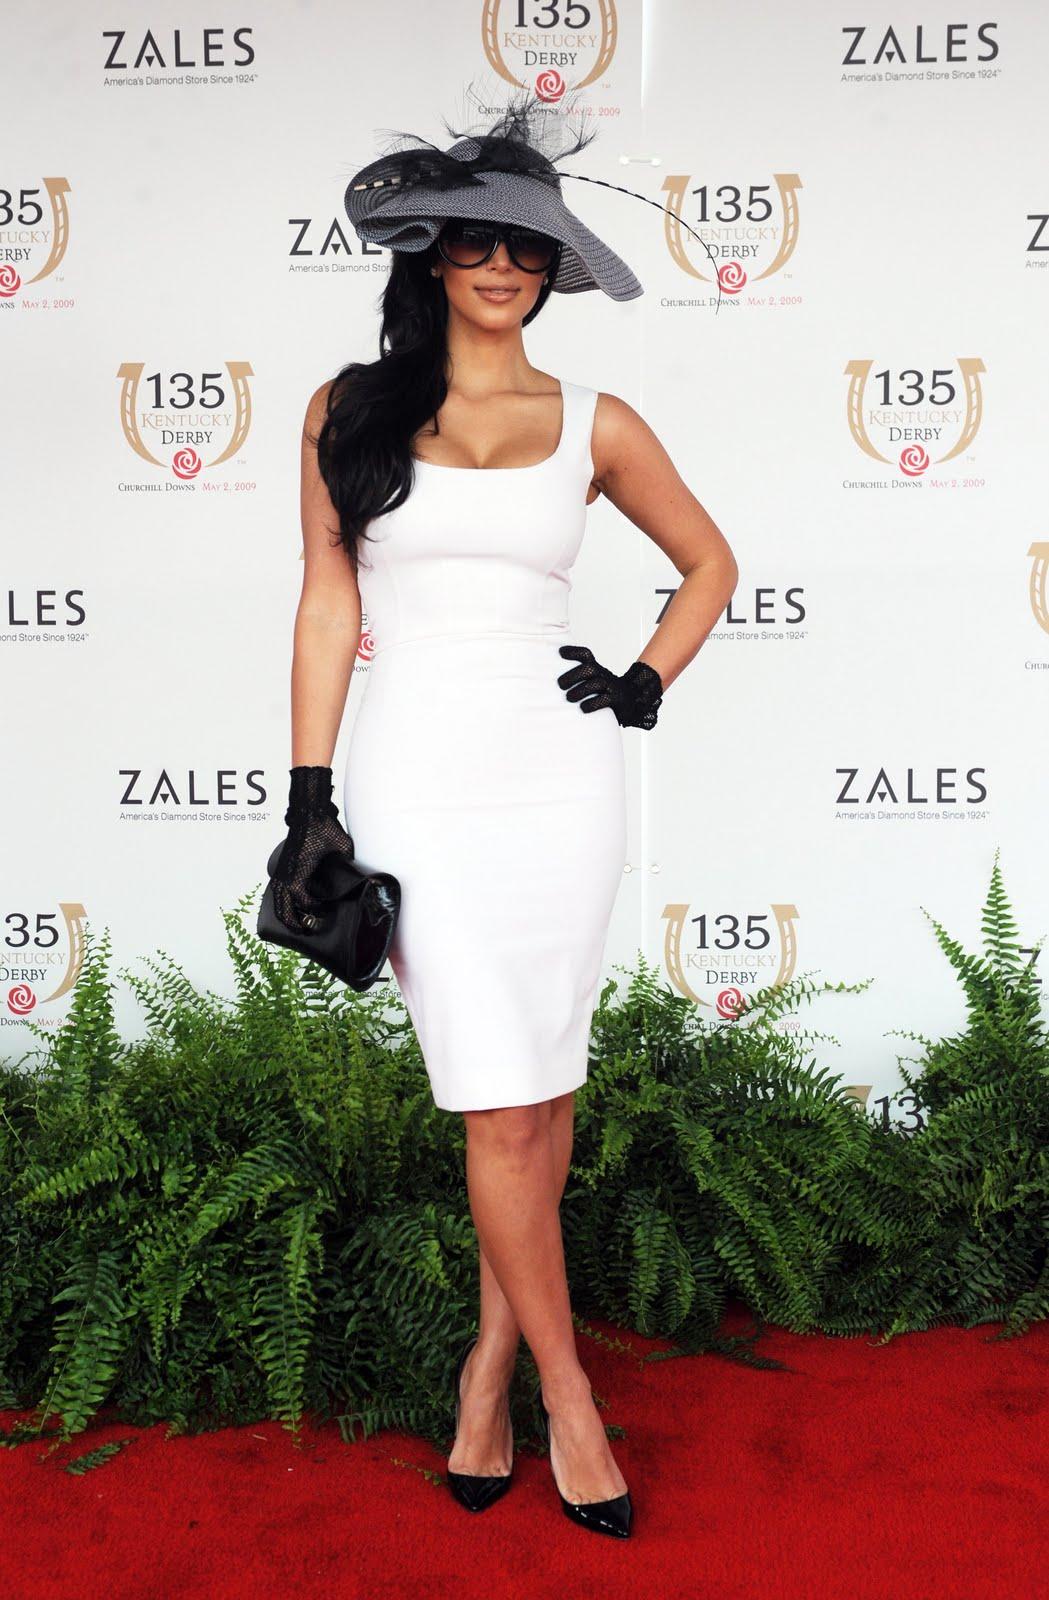 http://2.bp.blogspot.com/__dSMljhXGag/TBPQF4C97cI/AAAAAAAAC4U/Eo0yHEzkoPA/s1600/06209_Kim_Kardashian-135th_Kentucky_Derby_448_122_41lo.jpg